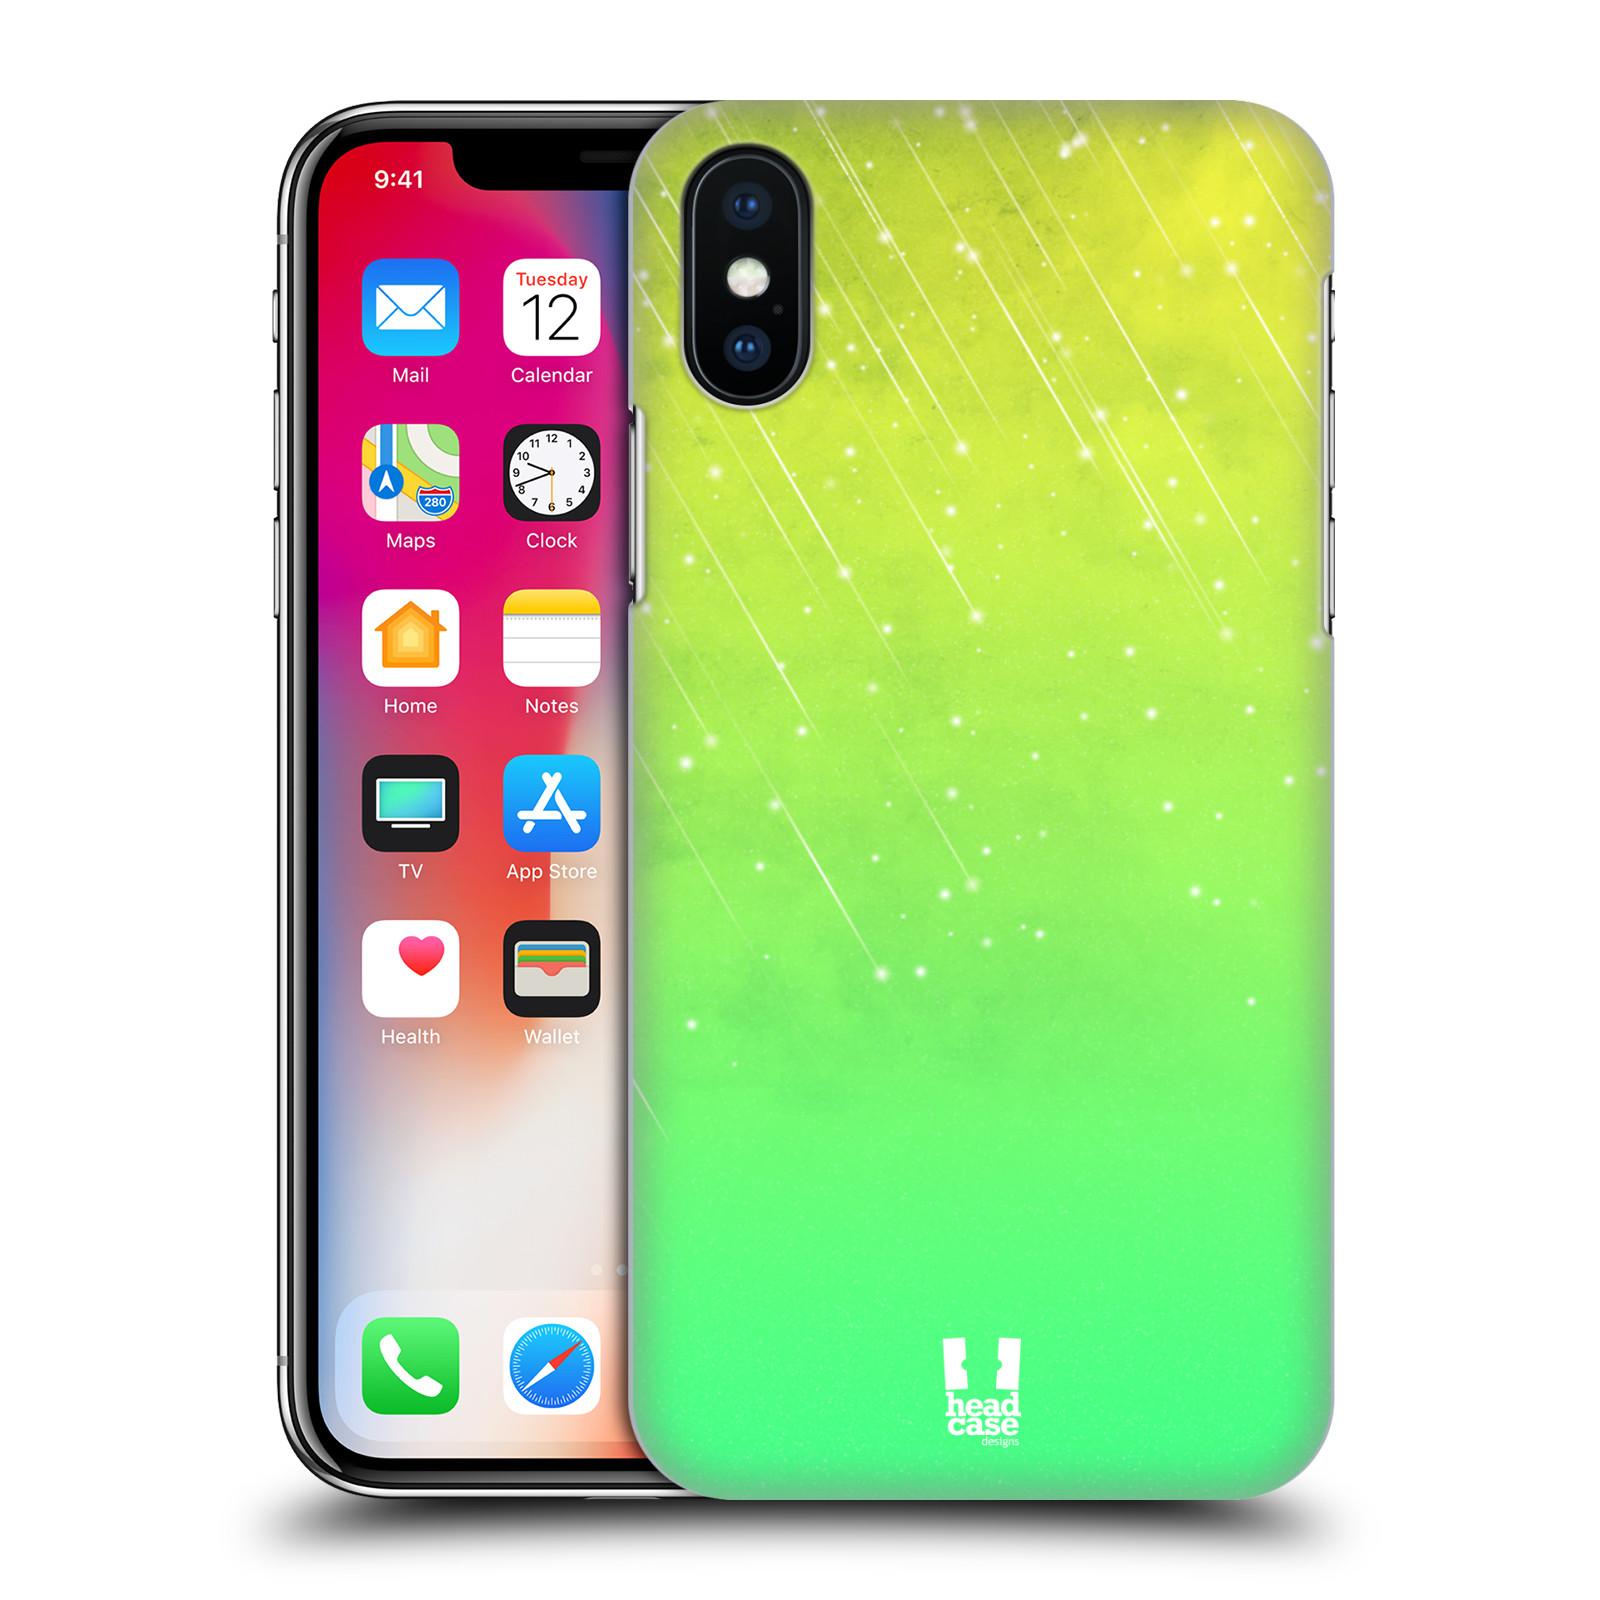 HEAD-CASE-DESIGNS-NEON-RAIN-OMBRE-HARD-BACK-CASE-FOR-APPLE-iPHONE-X